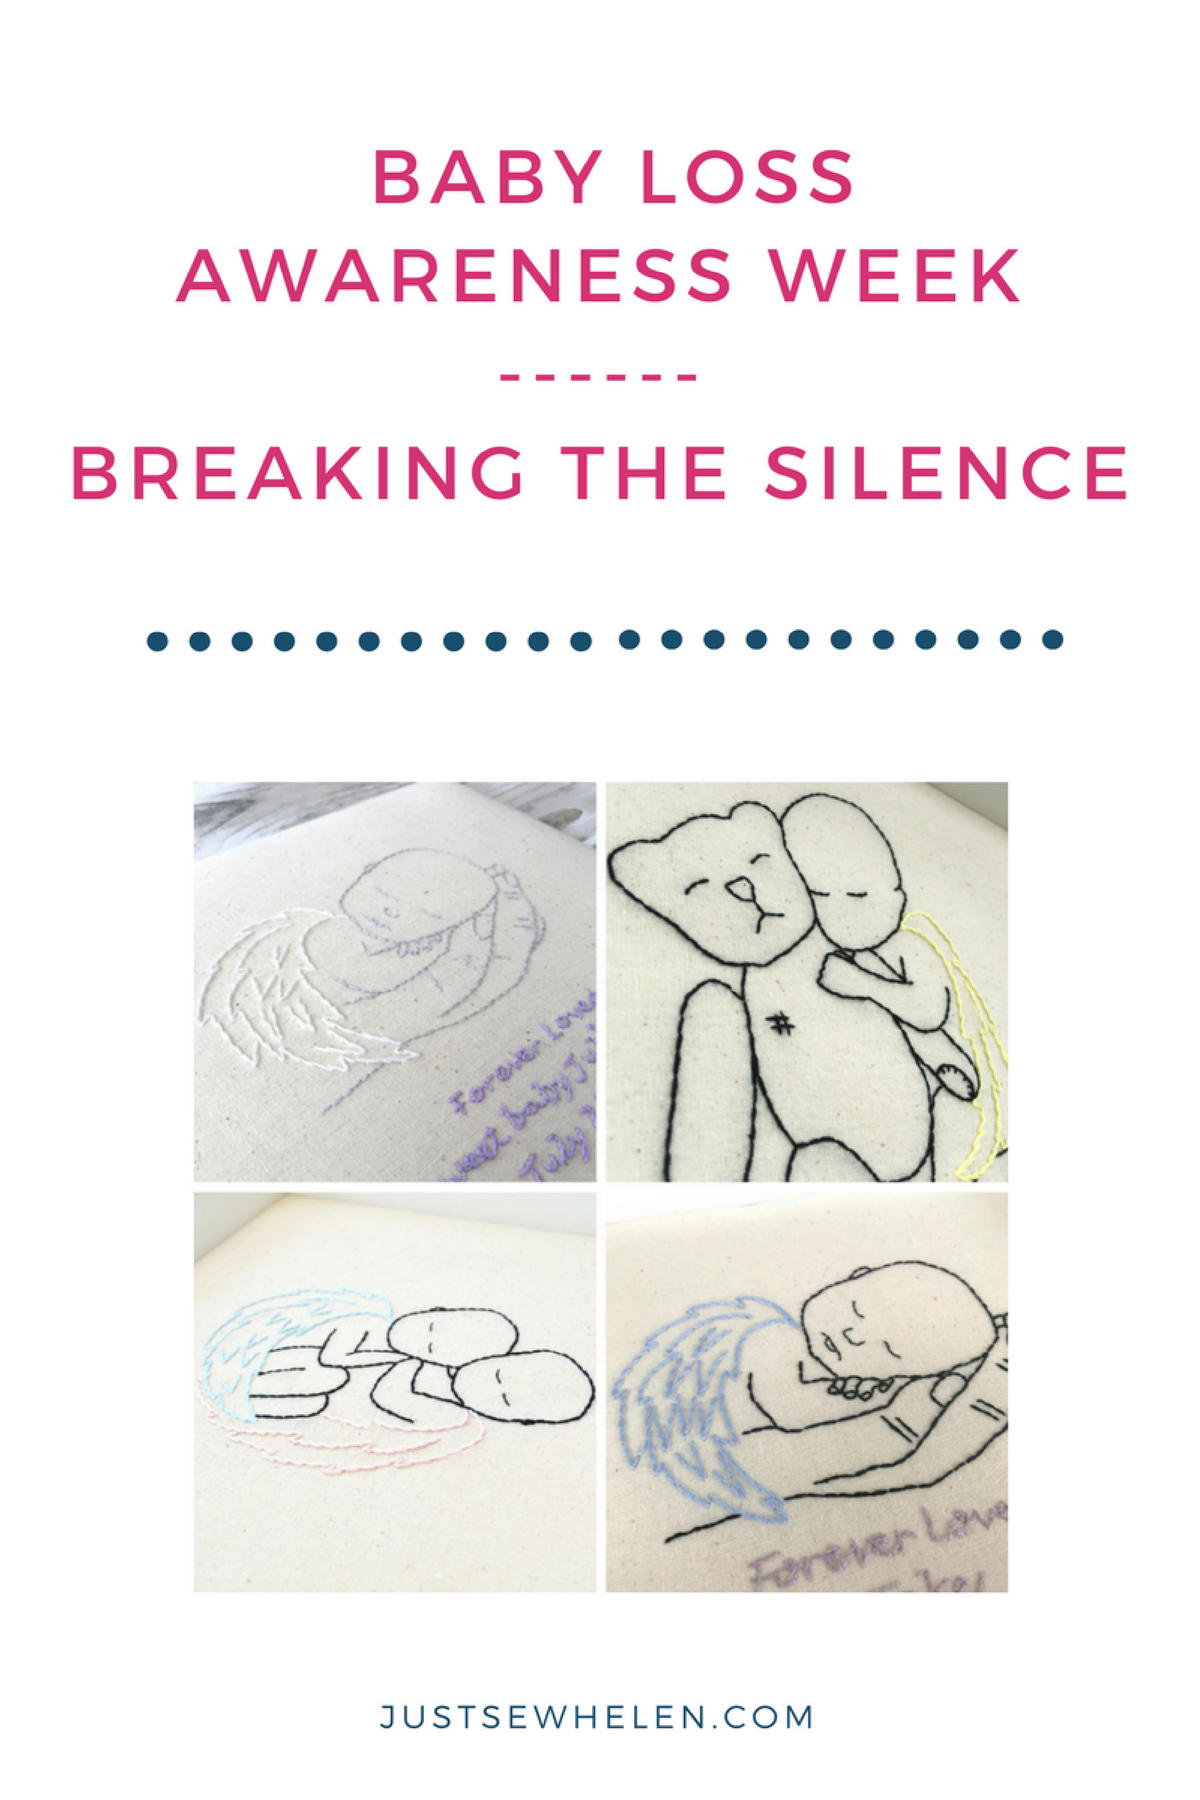 Breaking the silence - Baby Loss Awareness Week